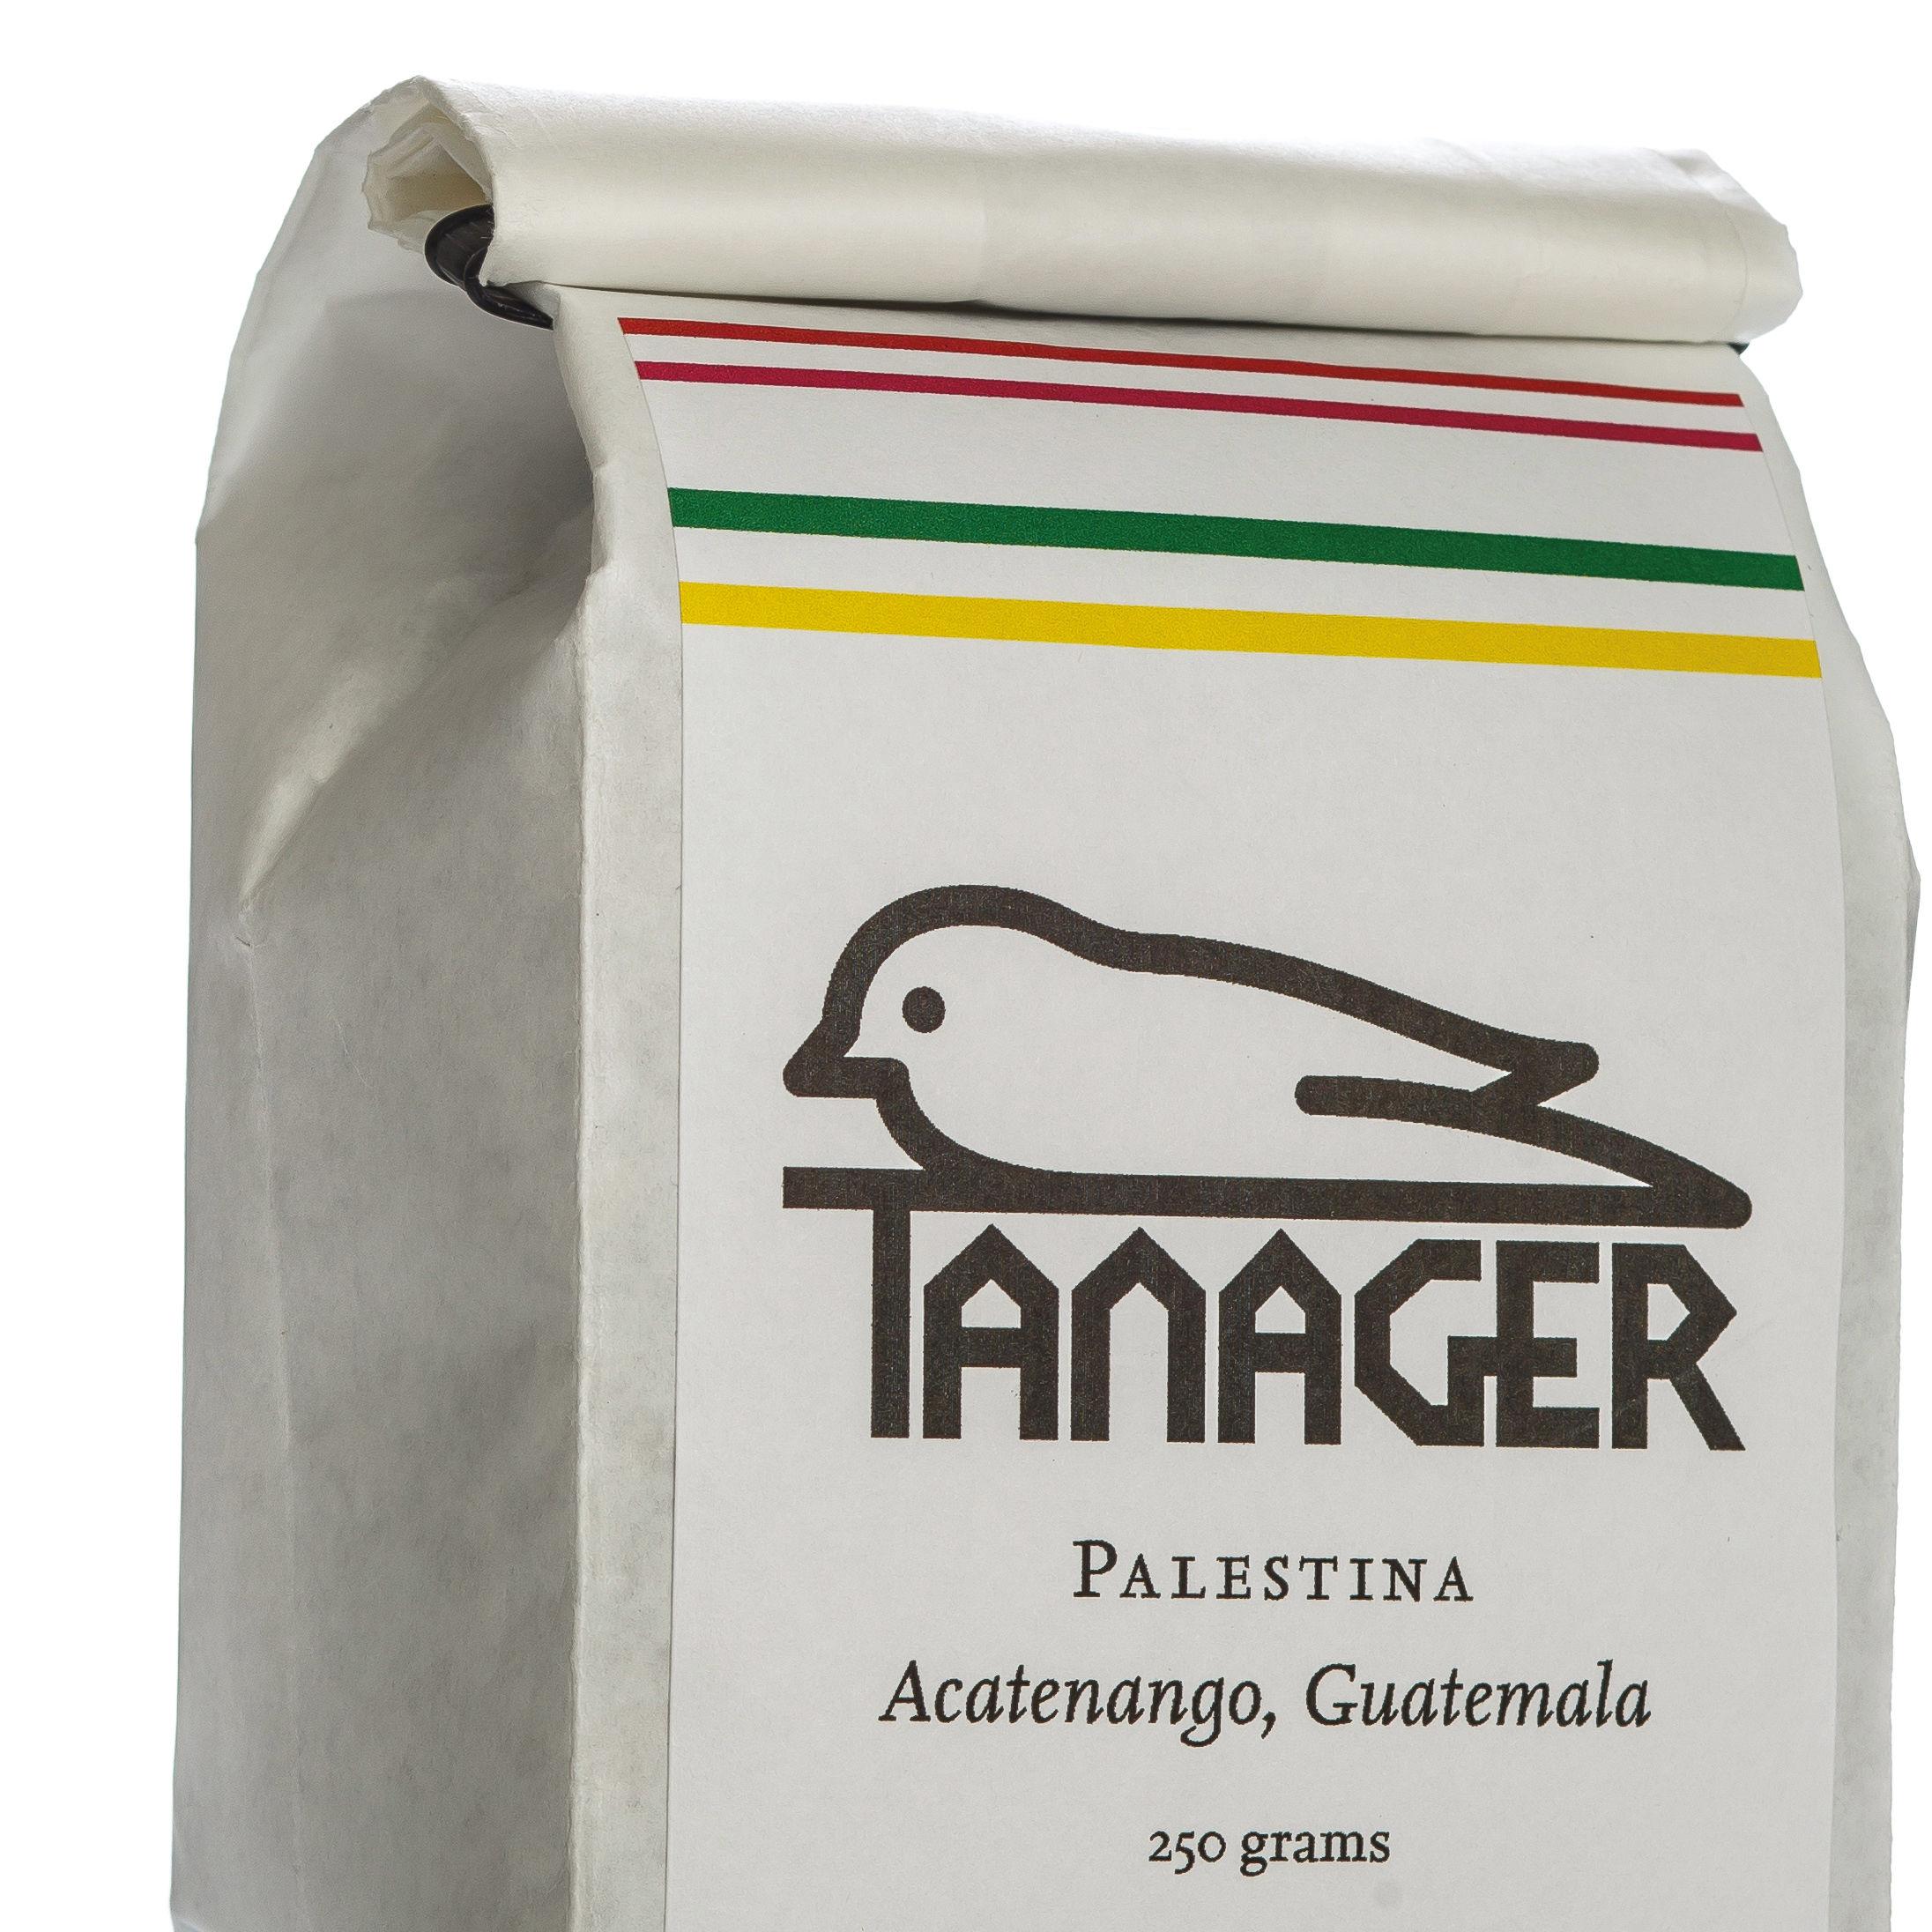 Pomo 0317 coffee packaging tanager sbzl7n